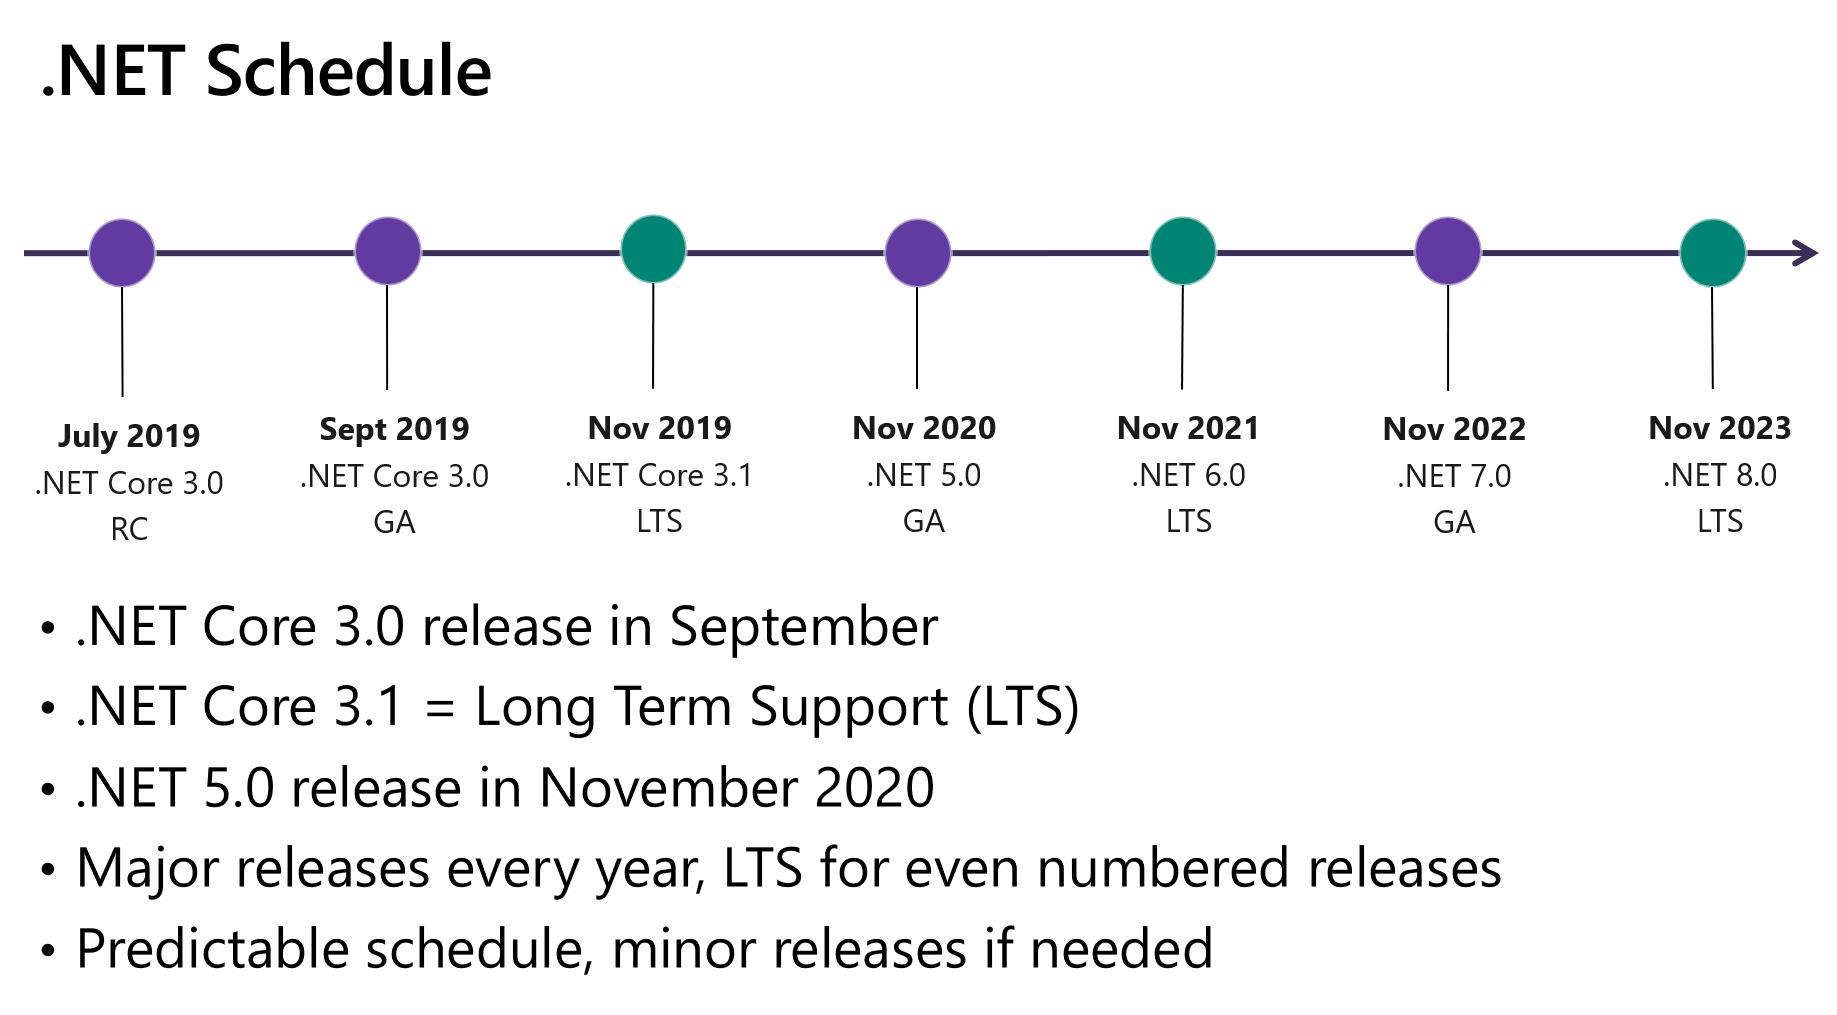 Image from https://devblogs.microsoft.com/dotnet/introducing-net-5/